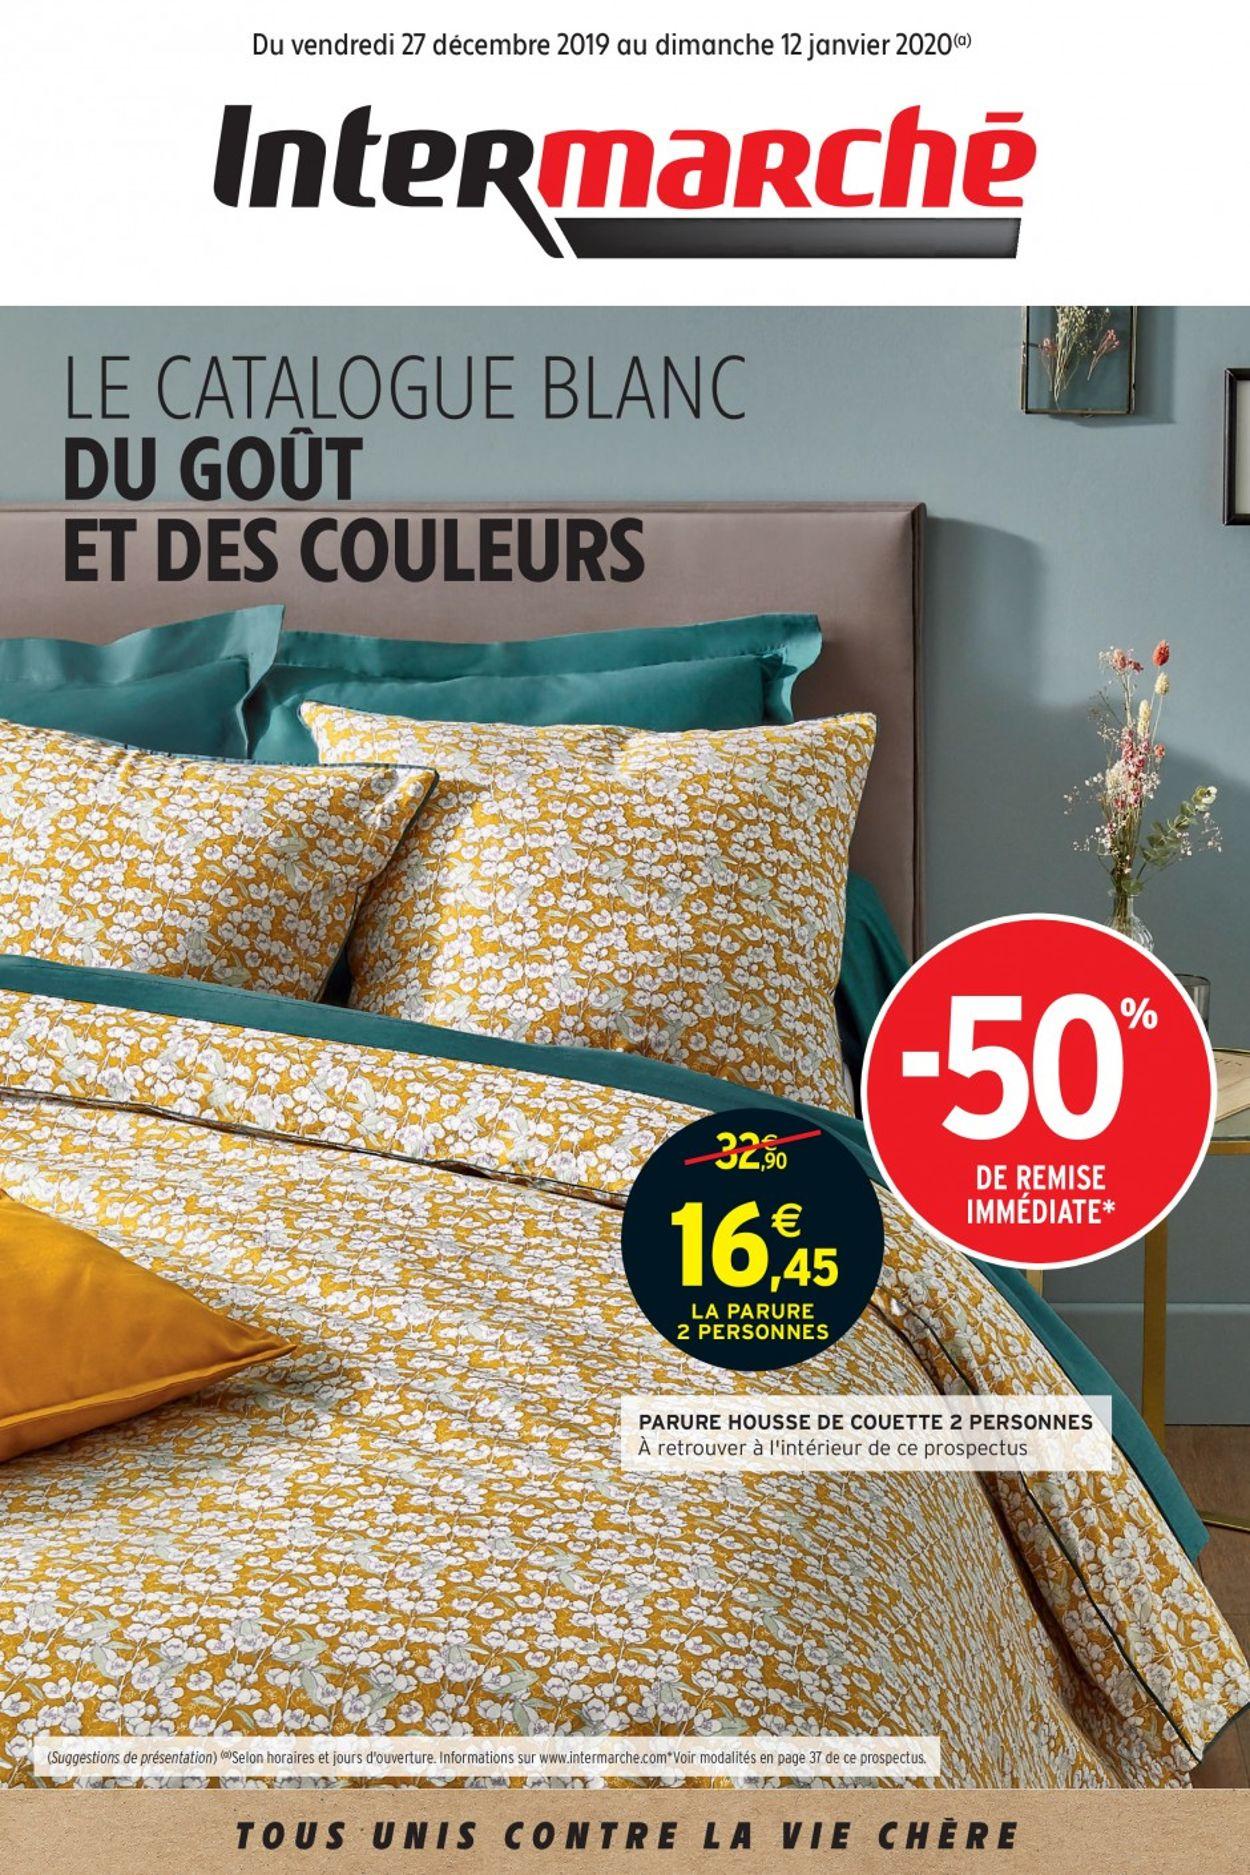 Intermarché Catalogue - 27.12-12.01.2020